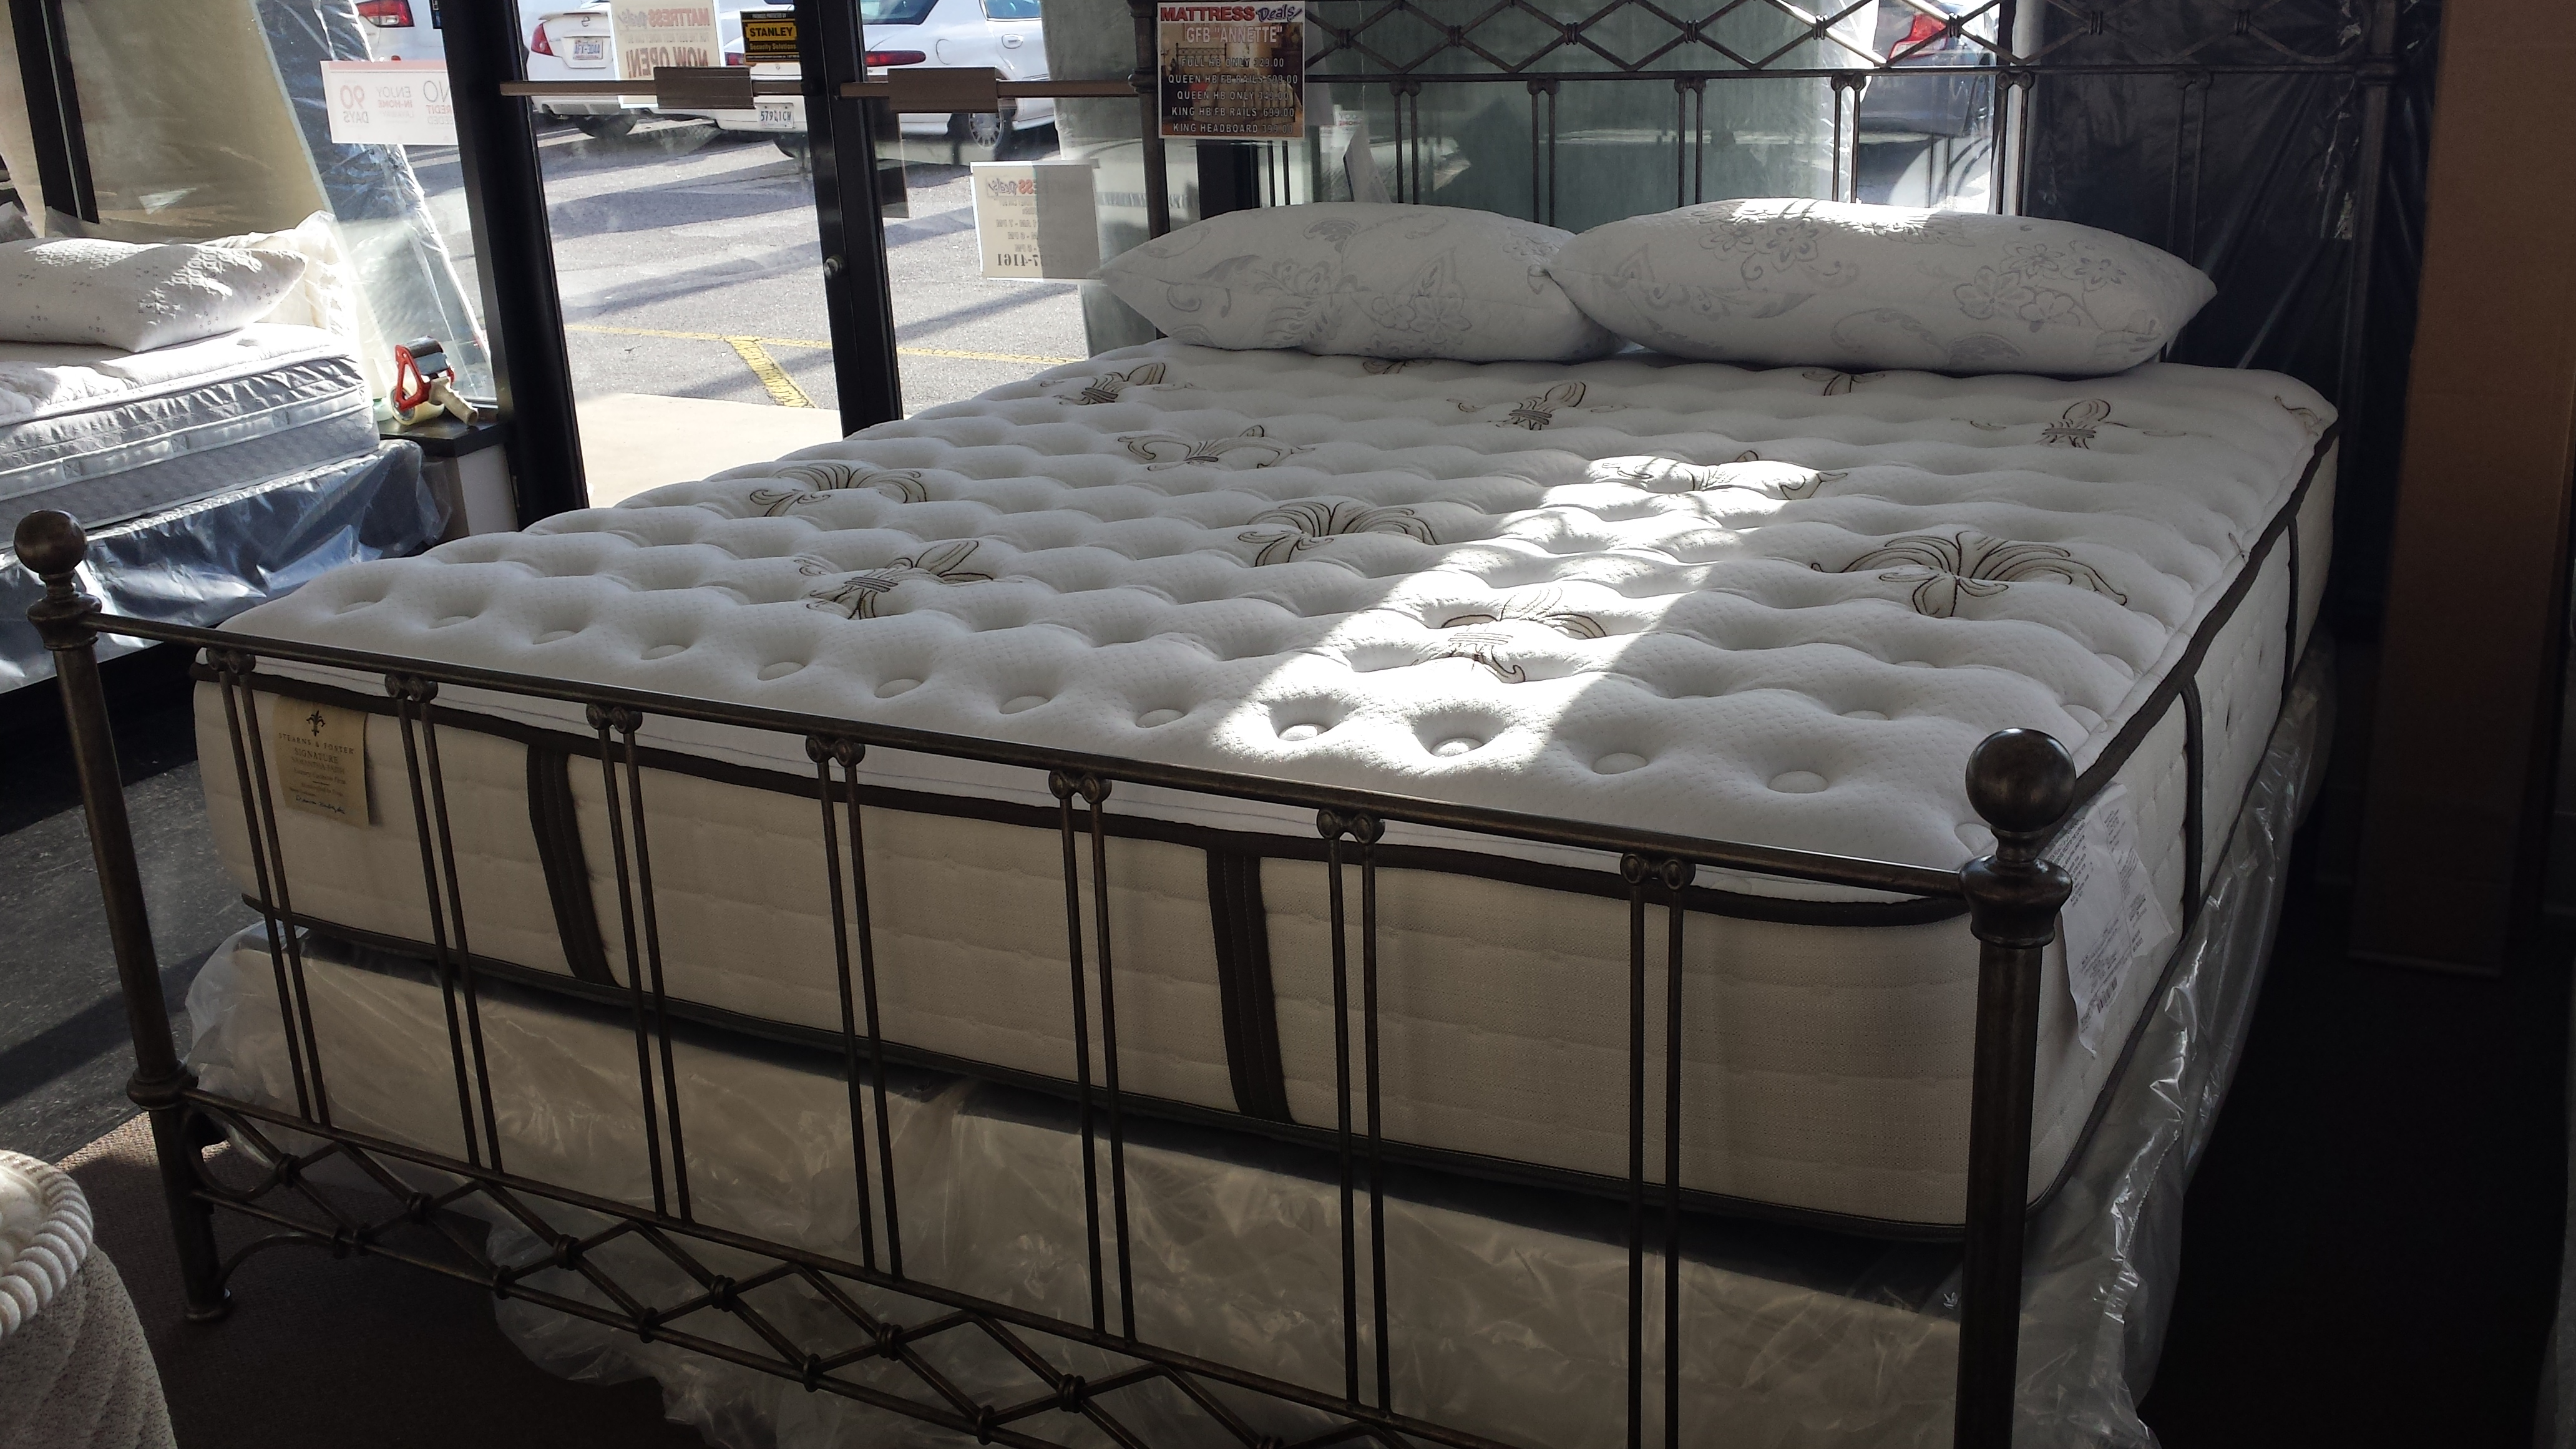 Beds and mattresses deals